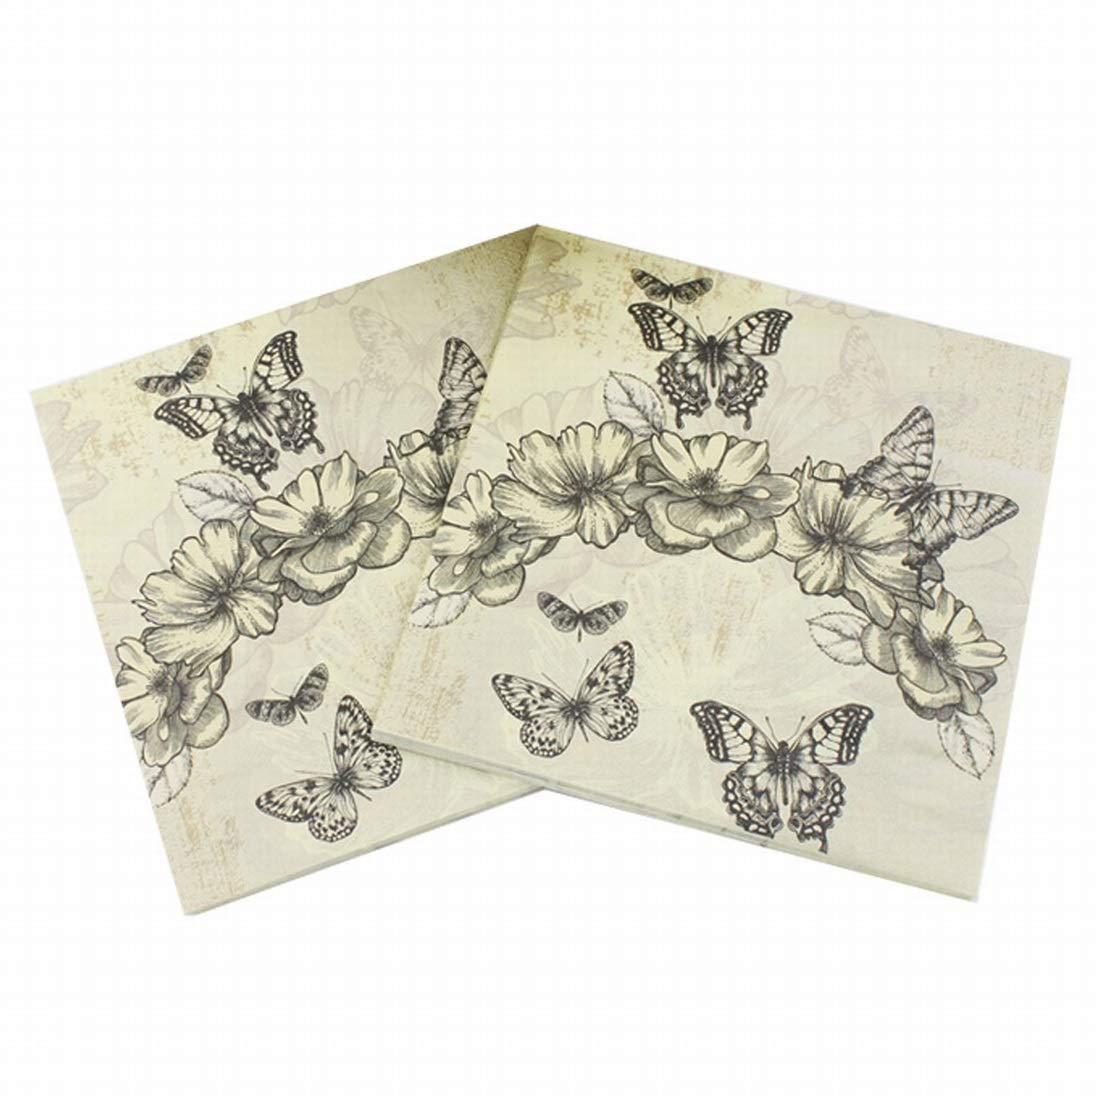 Karidesh Schmetterlings-Cartoon-Muster Original Zellstoff-Serviette, ideal für Brunch, Catering-Events, Dinner Parties, Buffets, Frühlingshochzeiten oder den täglichen Gebrauch, 5er Pack